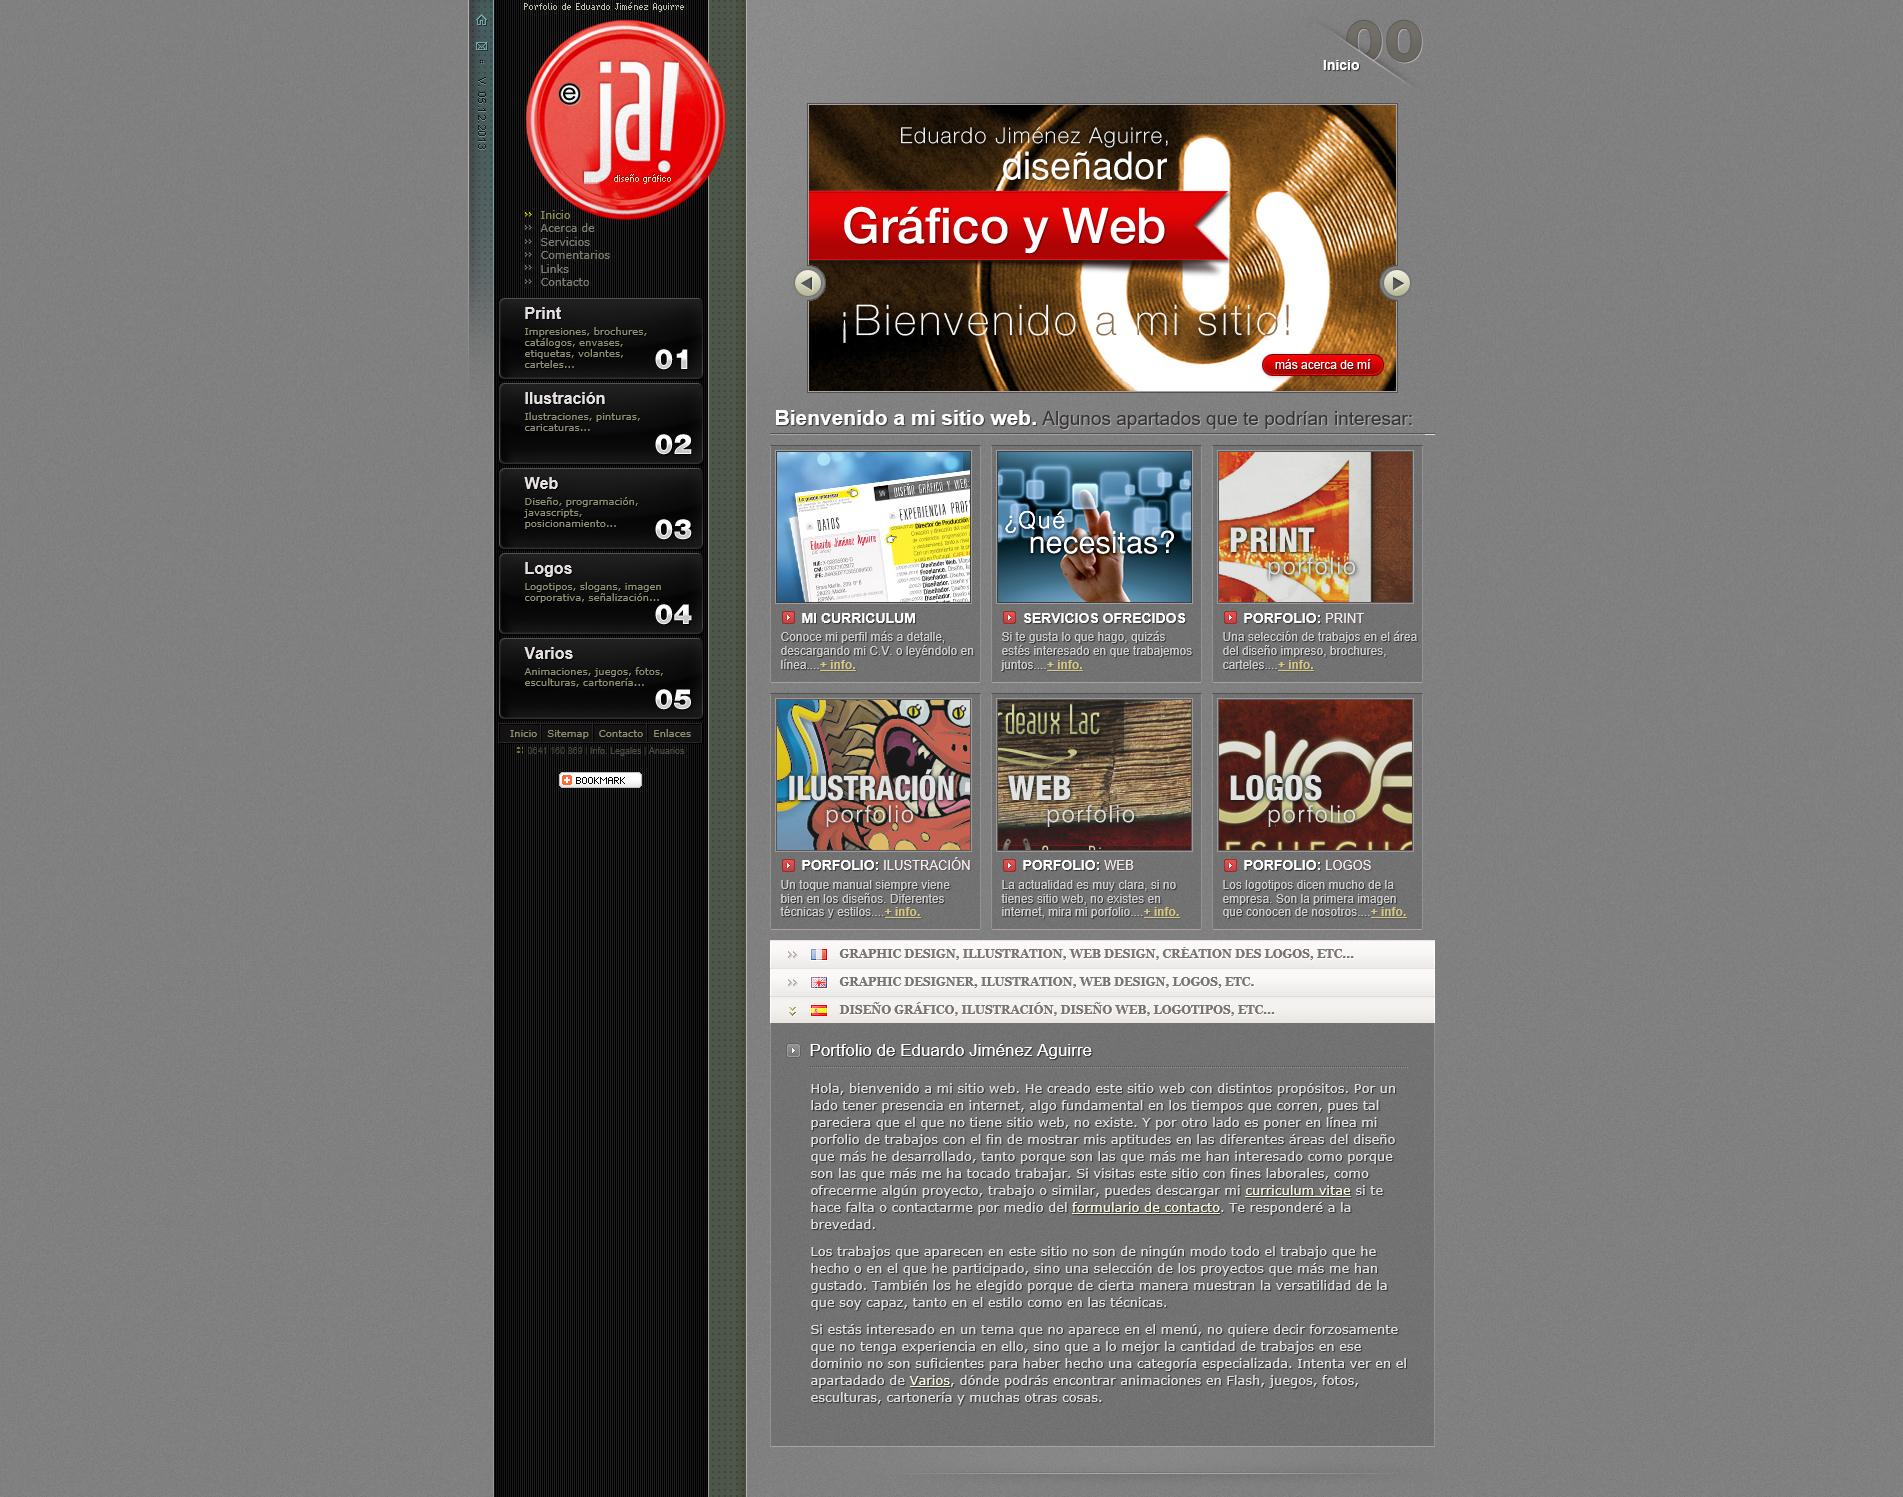 Jagui.com